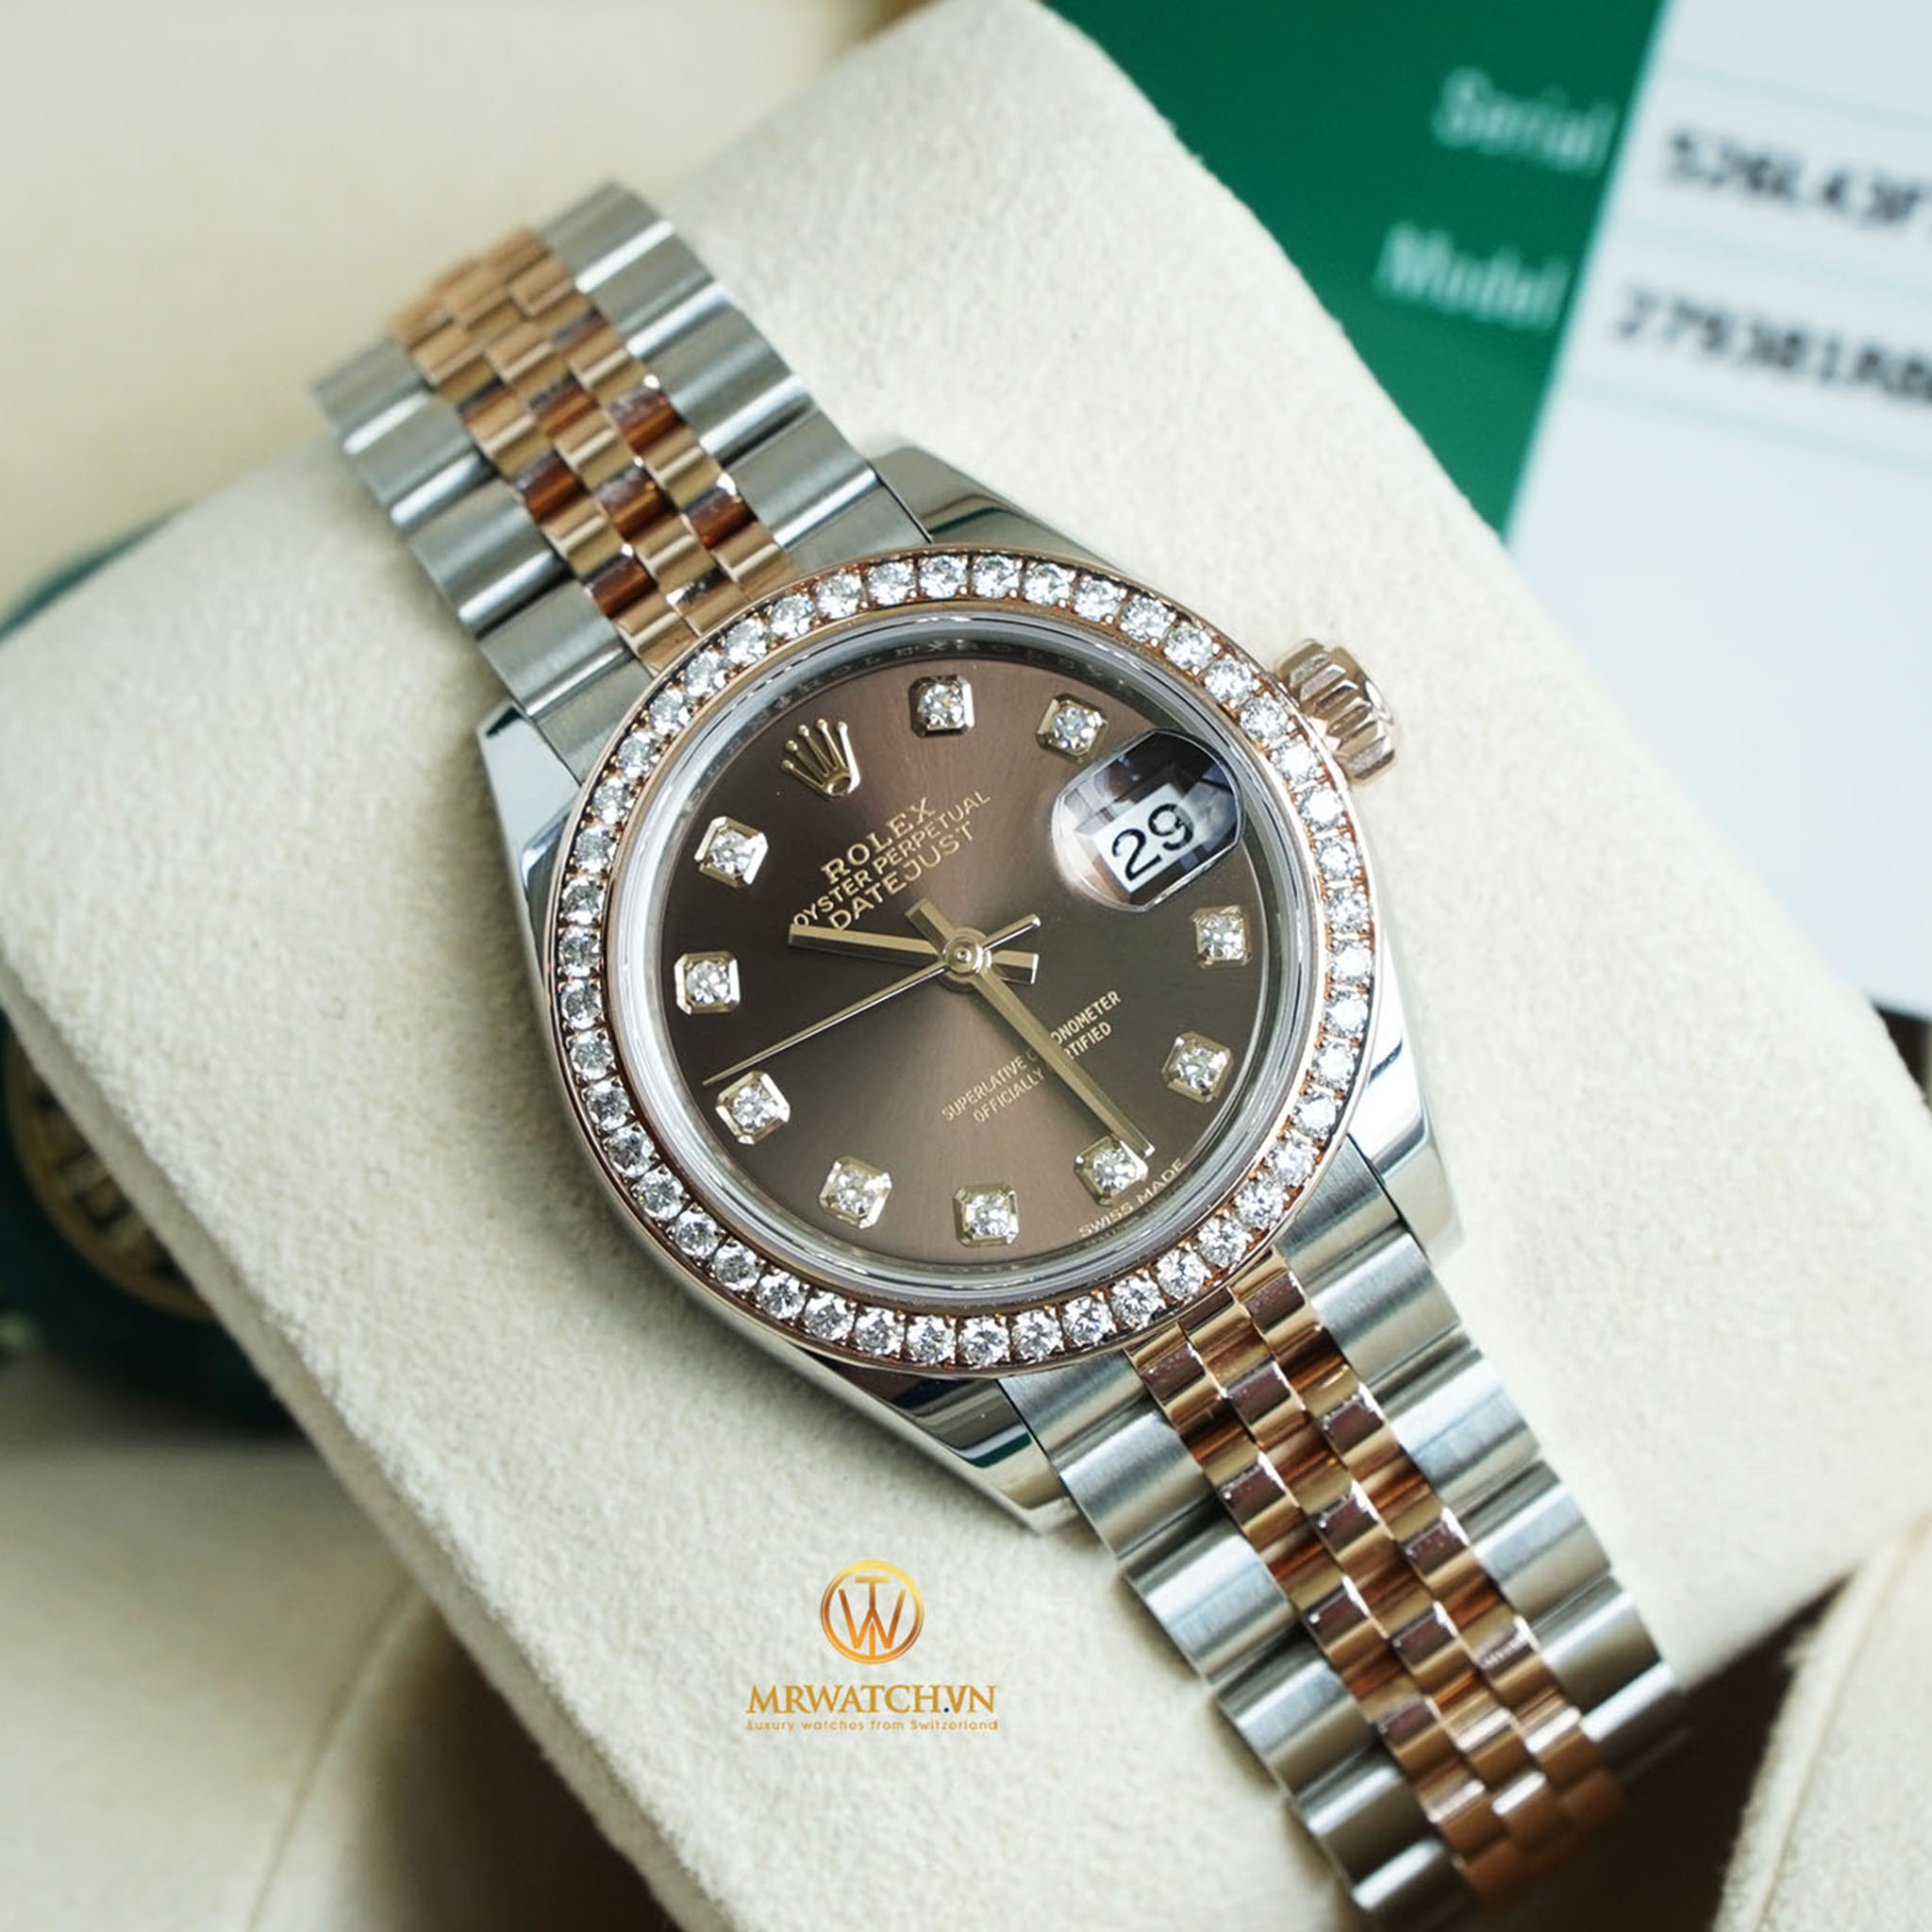 ROLEX LADY-DATEJUST 279381RBR Oyster, 28 mm, Oystersteel, vàng Eversose và kim cương